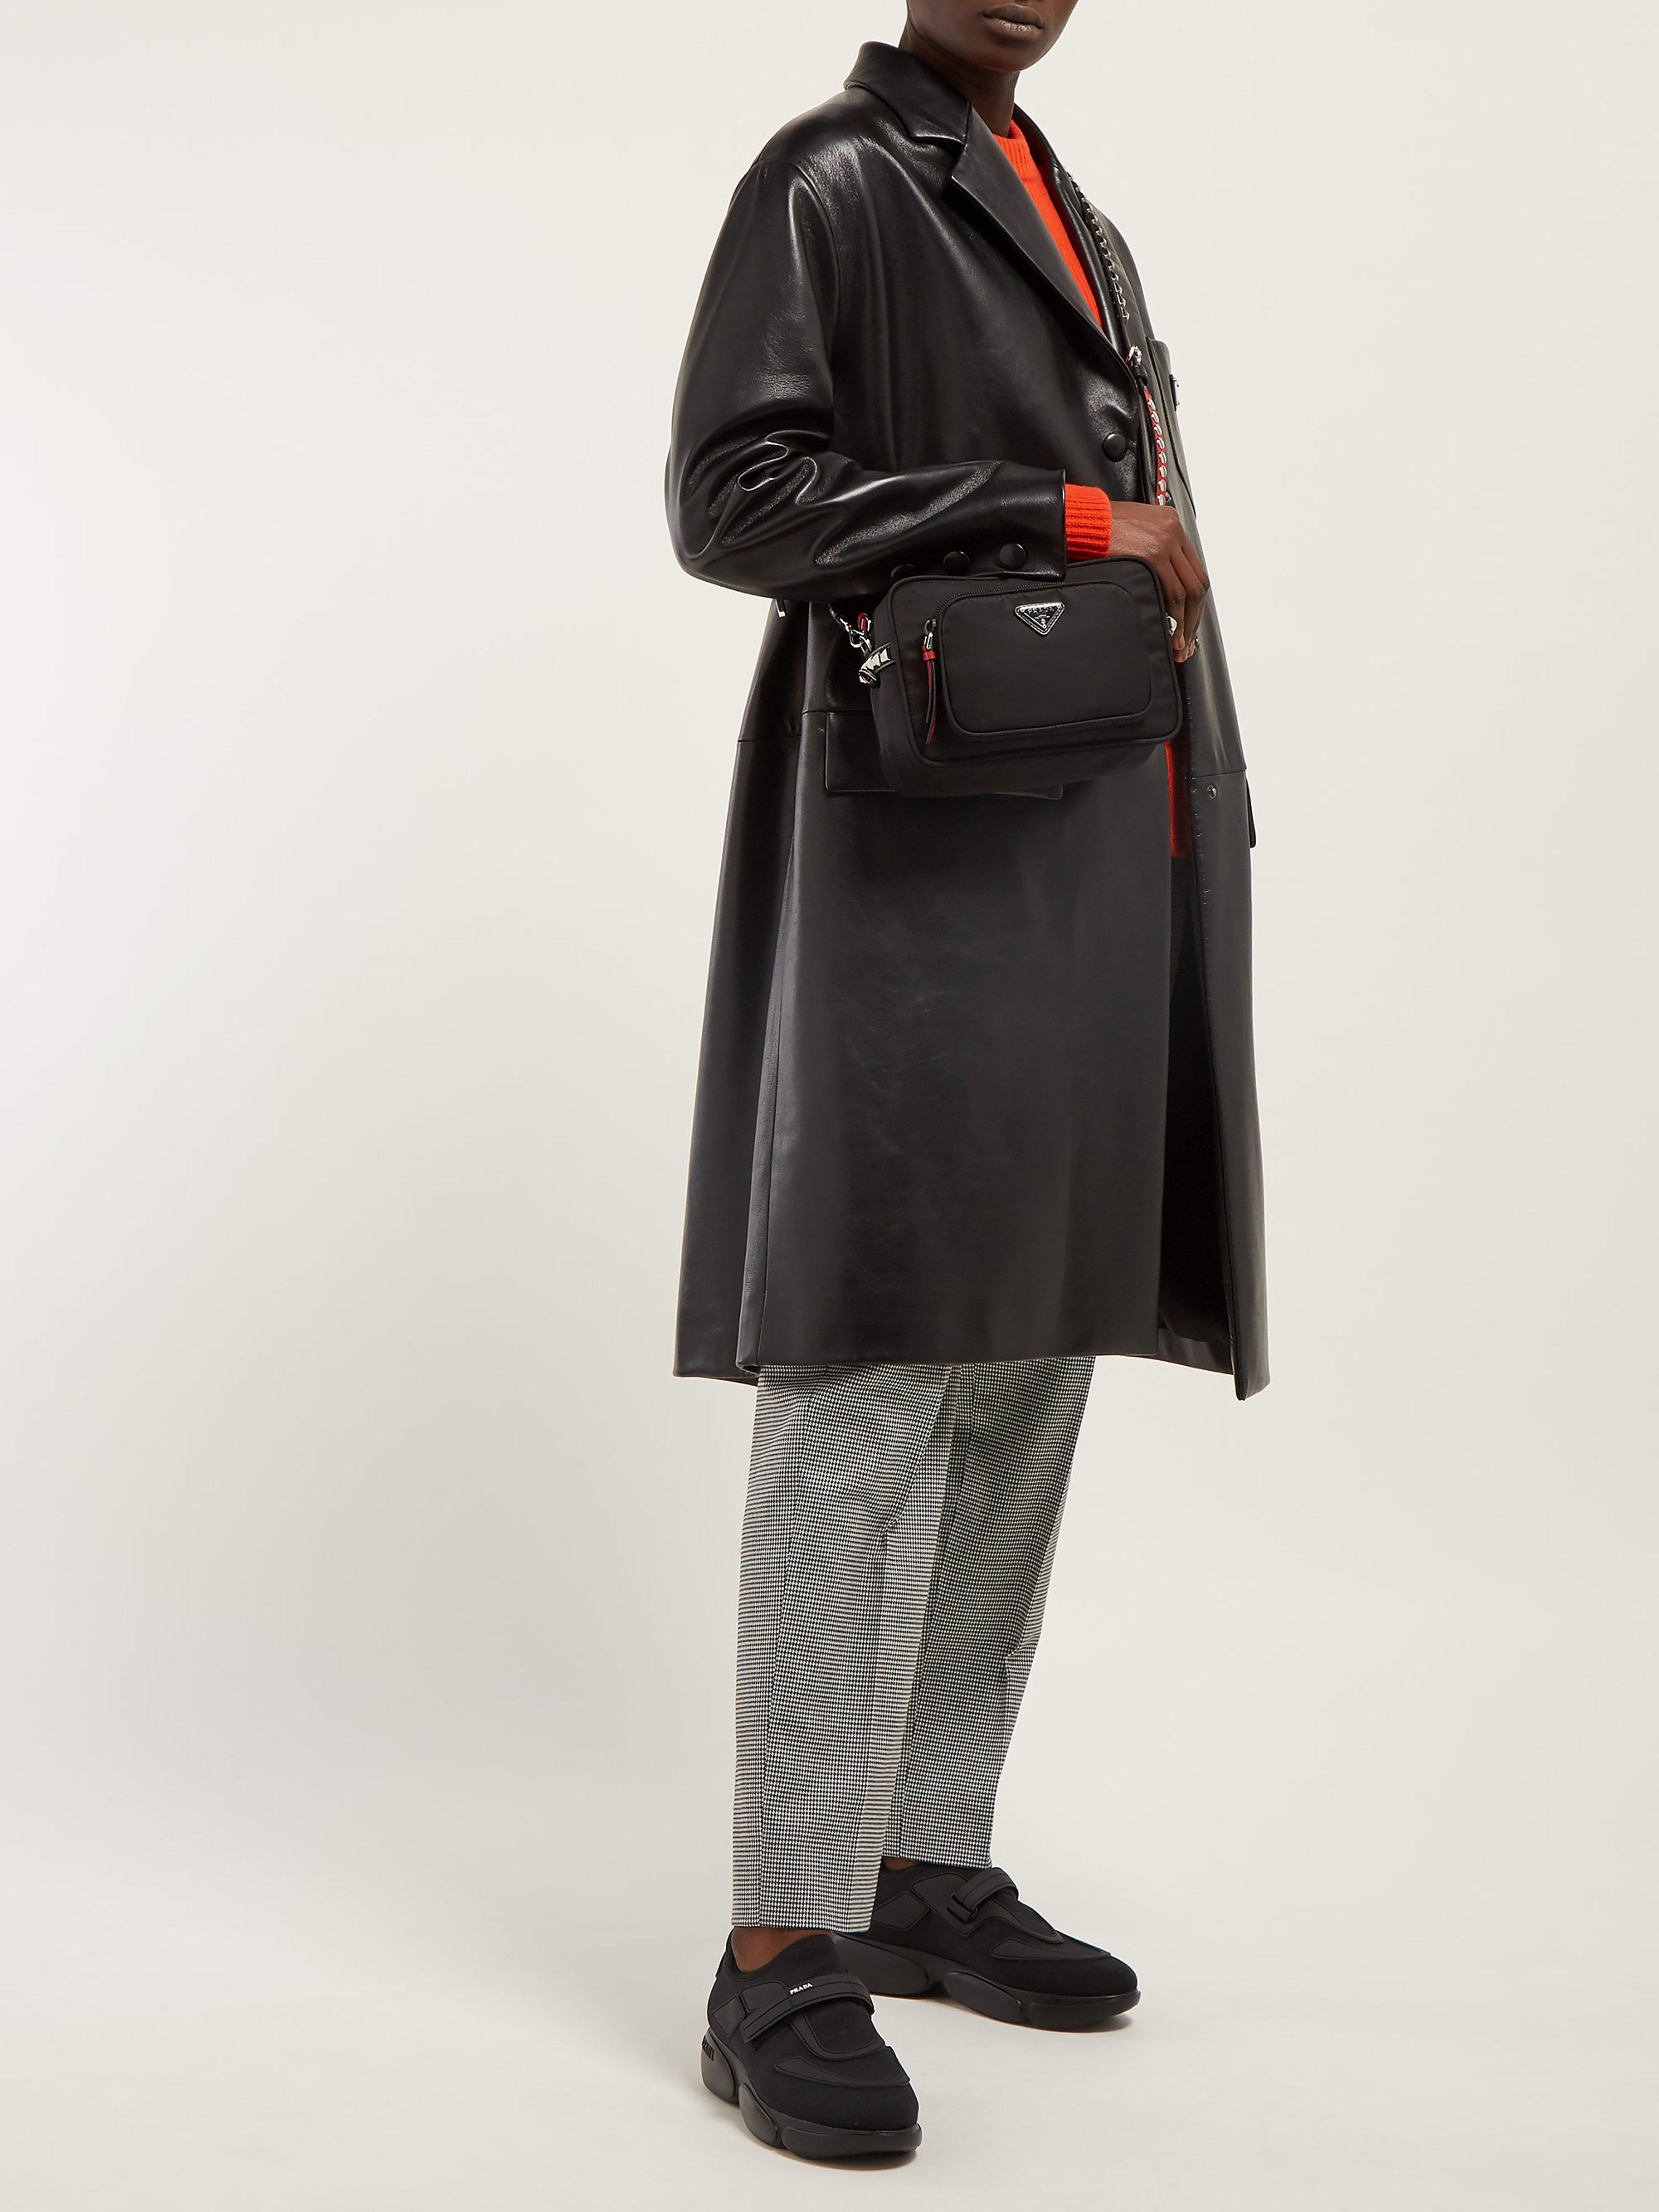 b7a76b34dac6 Prada - Black New Vela Mini Studded Nylon Cross Body Bag - Lyst. View  fullscreen